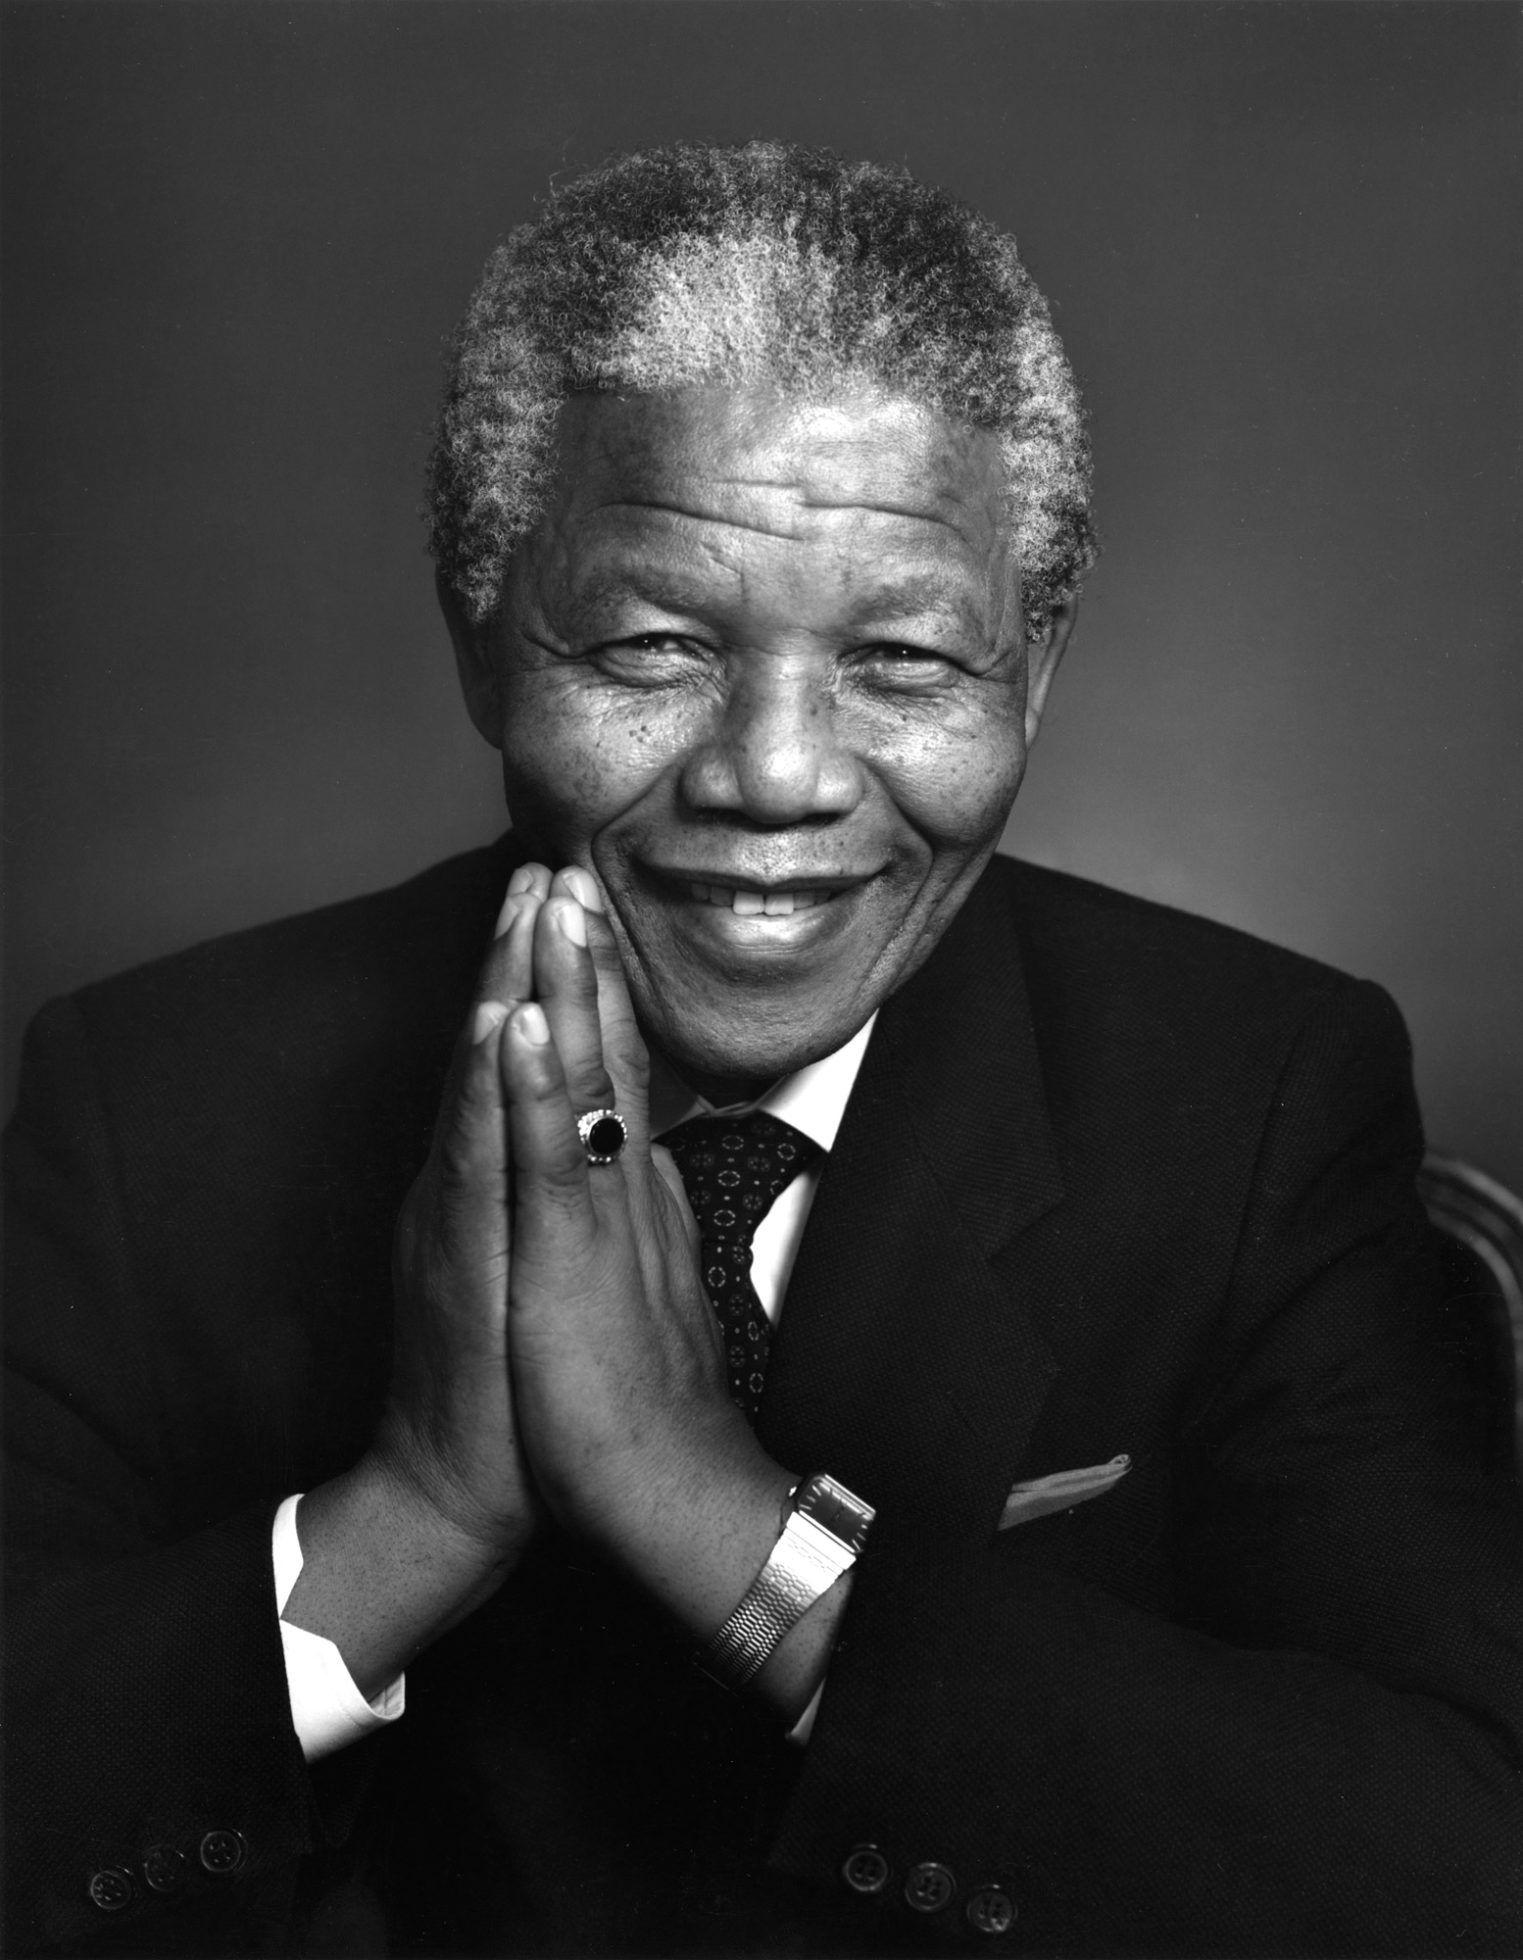 Biografia Corta De Nelson Mandela Vida Y Obra Del Lider